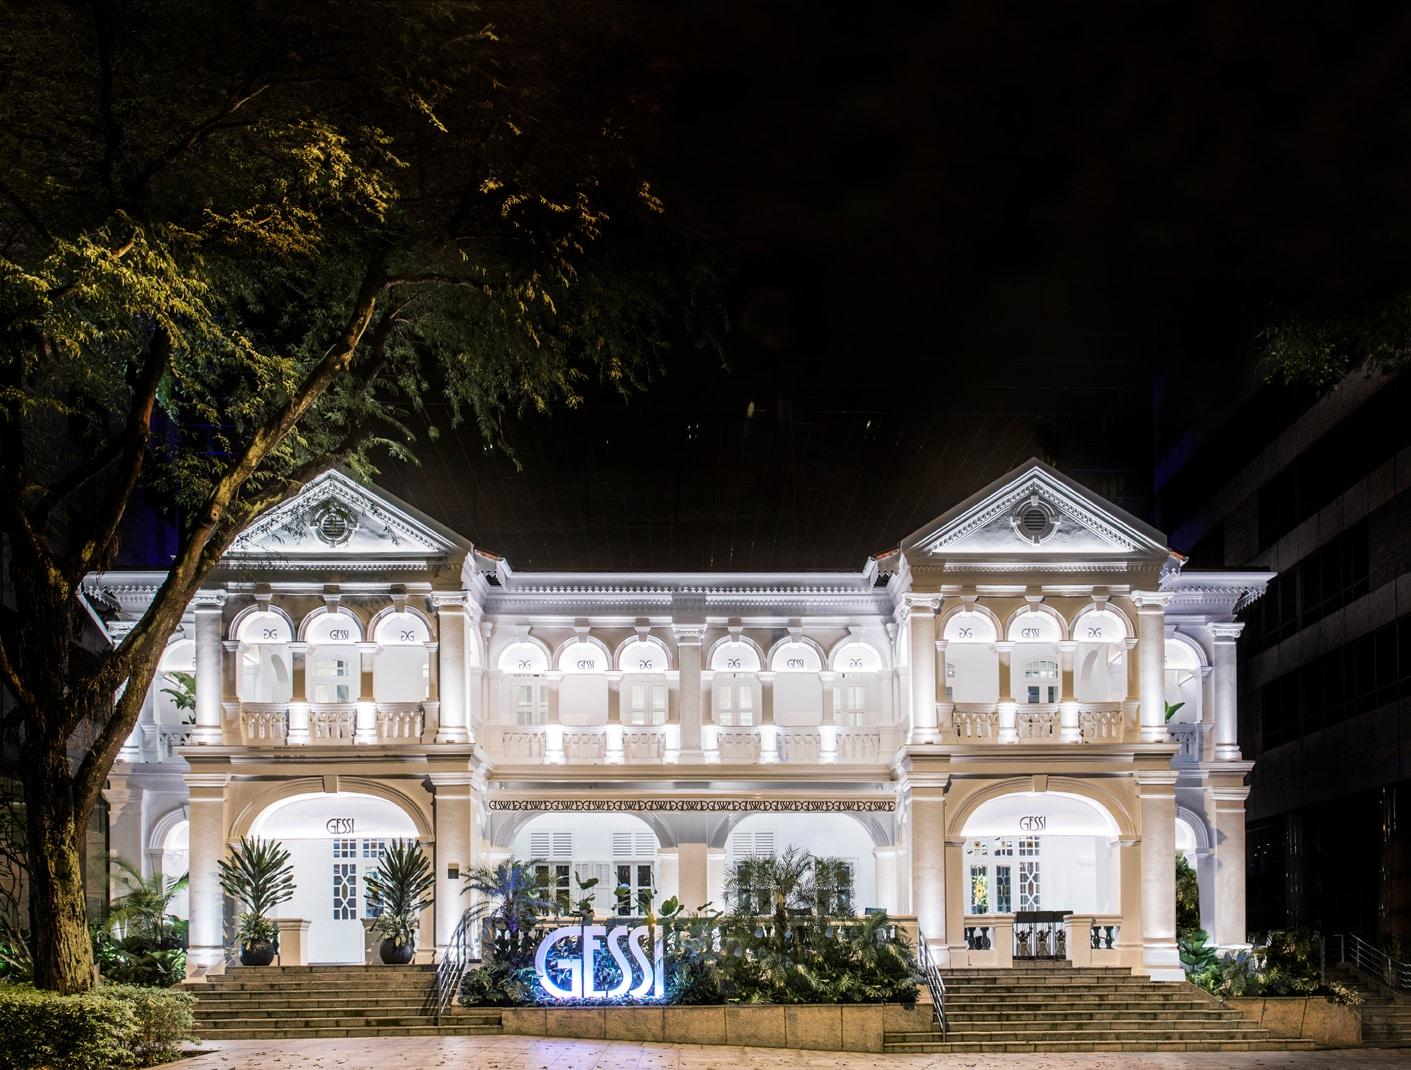 Casa Gessi a Singapore